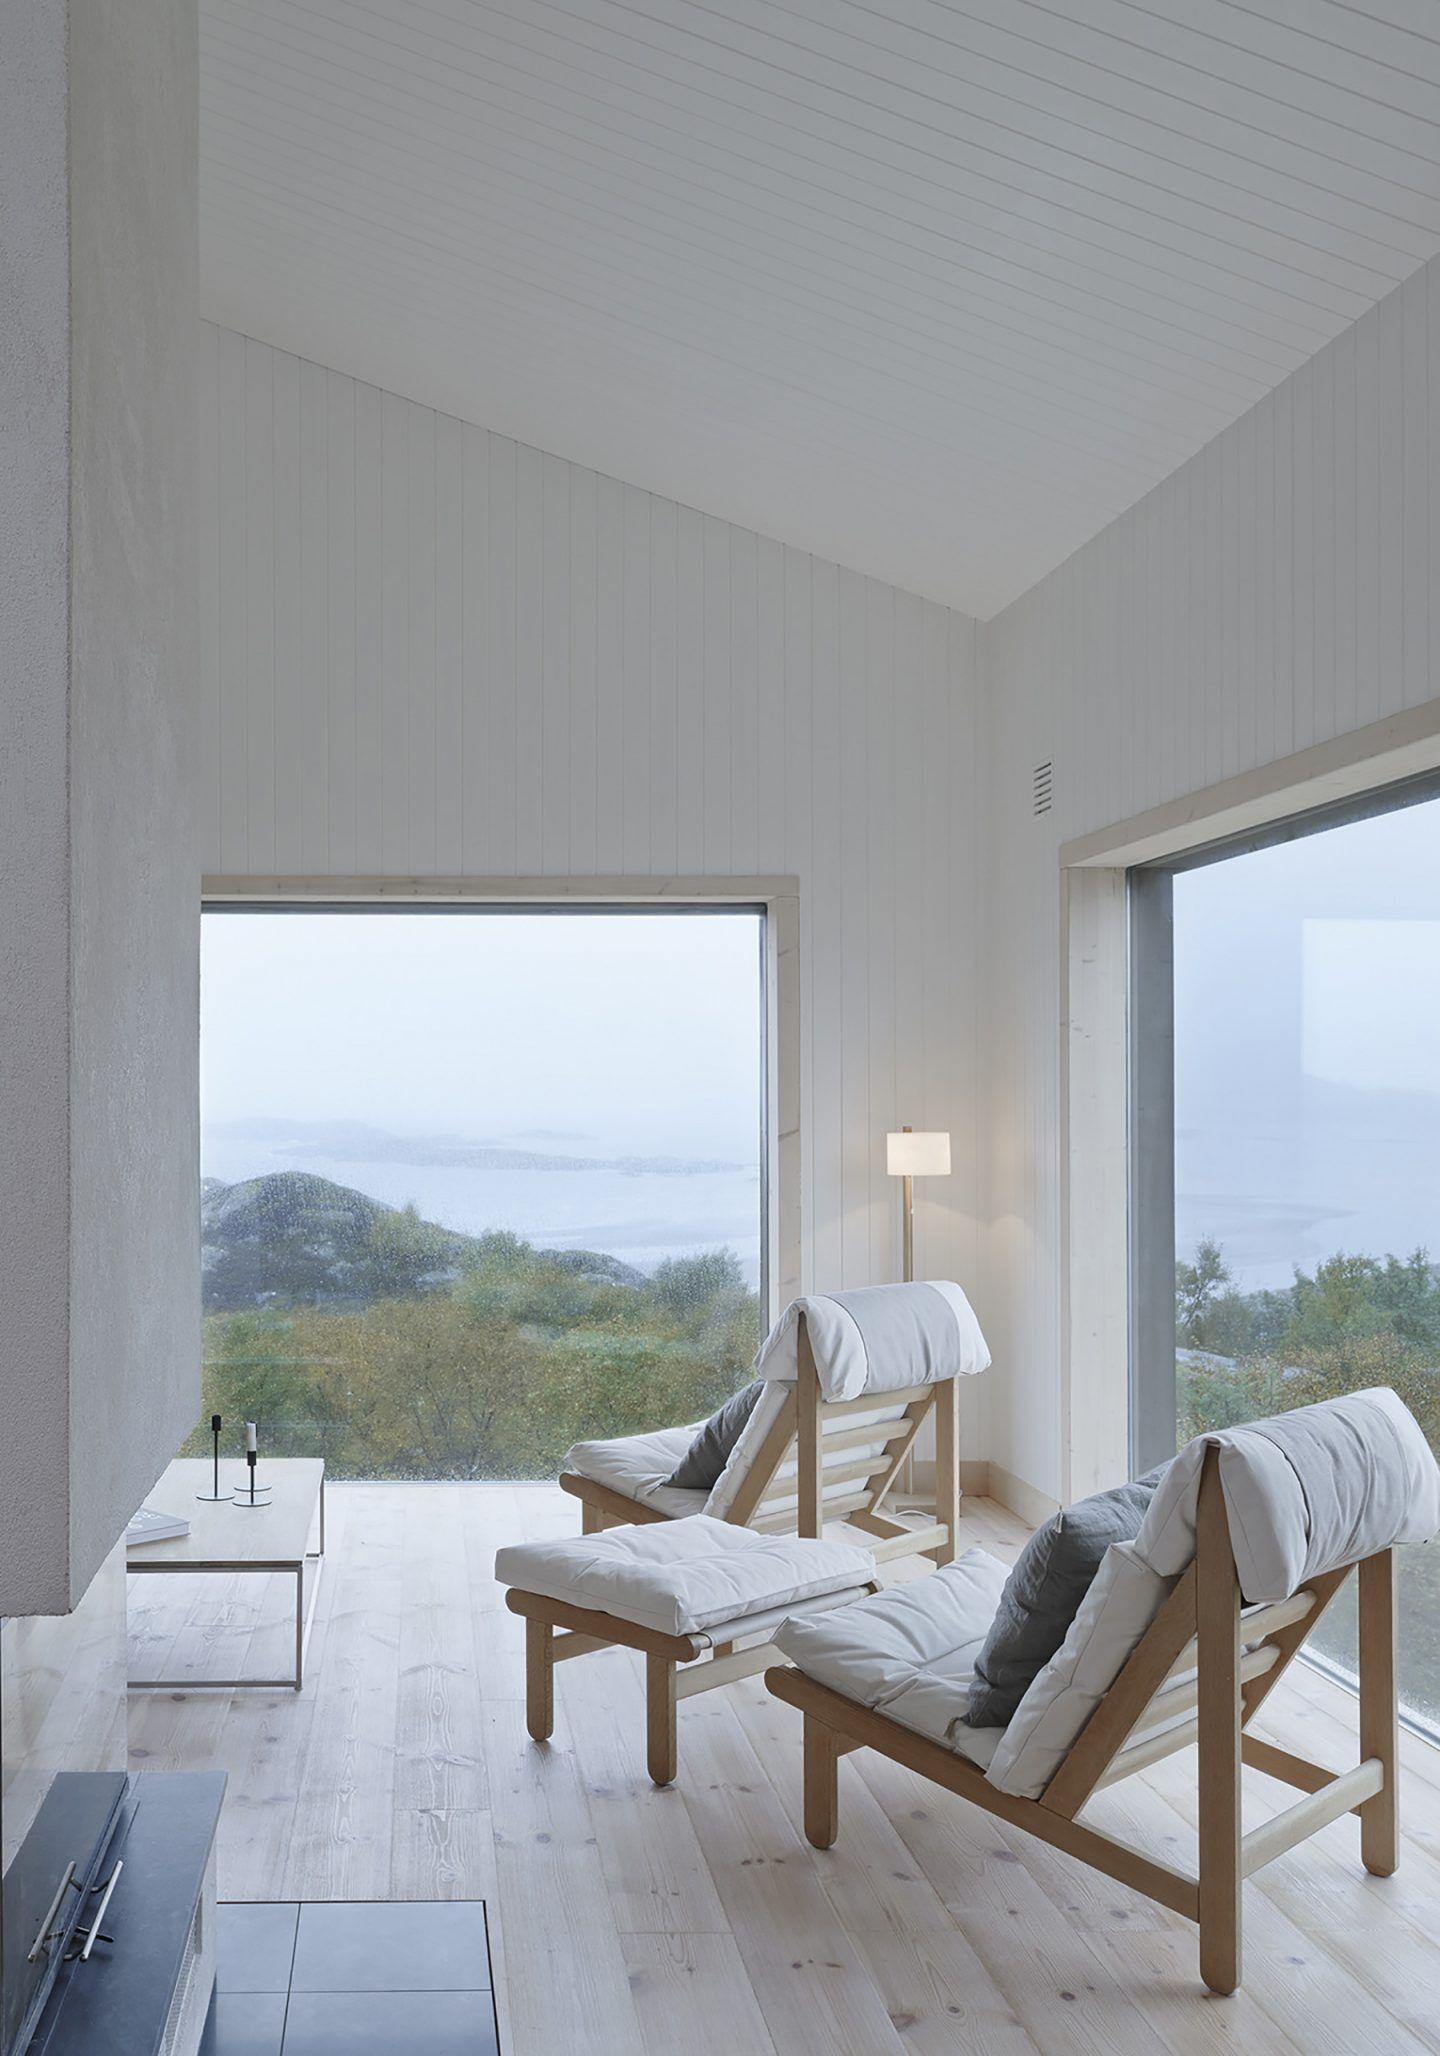 IGNANT-Architecture-Kolman-Boye-Vega-Cottage-2